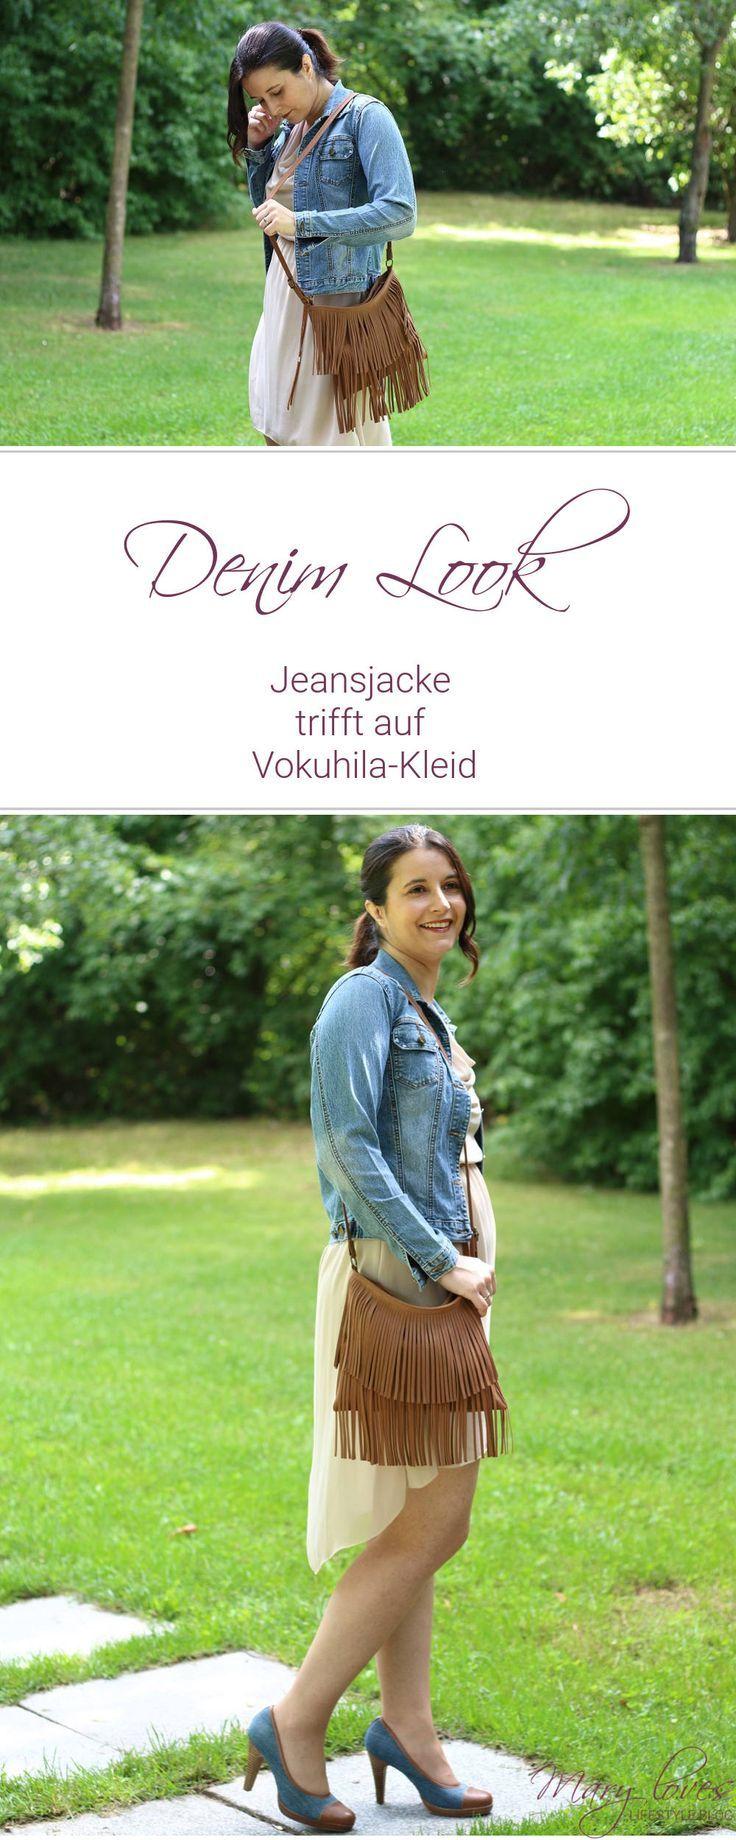 76933d6b5611d Denim Look - Jeansjacke trifft auf Vokuhila-Kleid